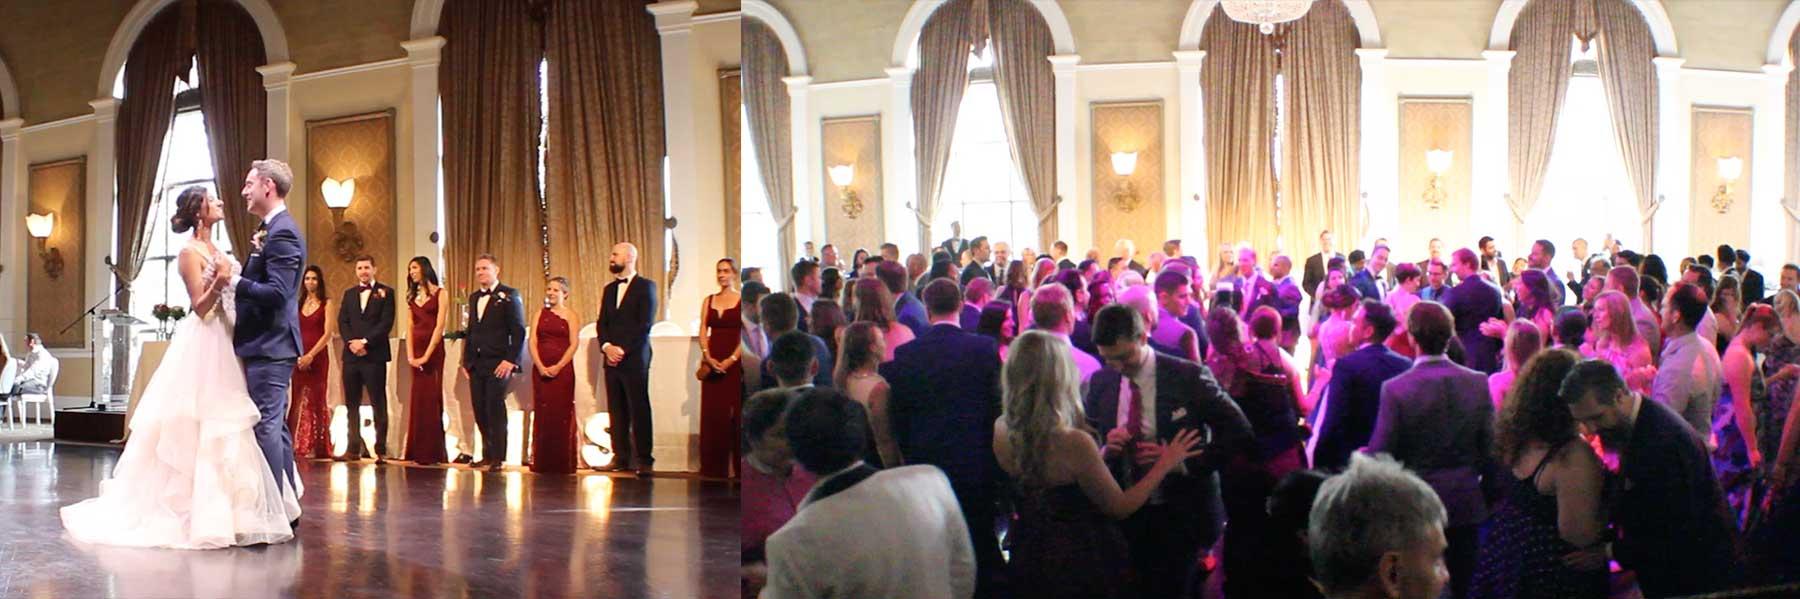 Wedding-DJ-Toronto-Liberty-Grand-Centenial-Room